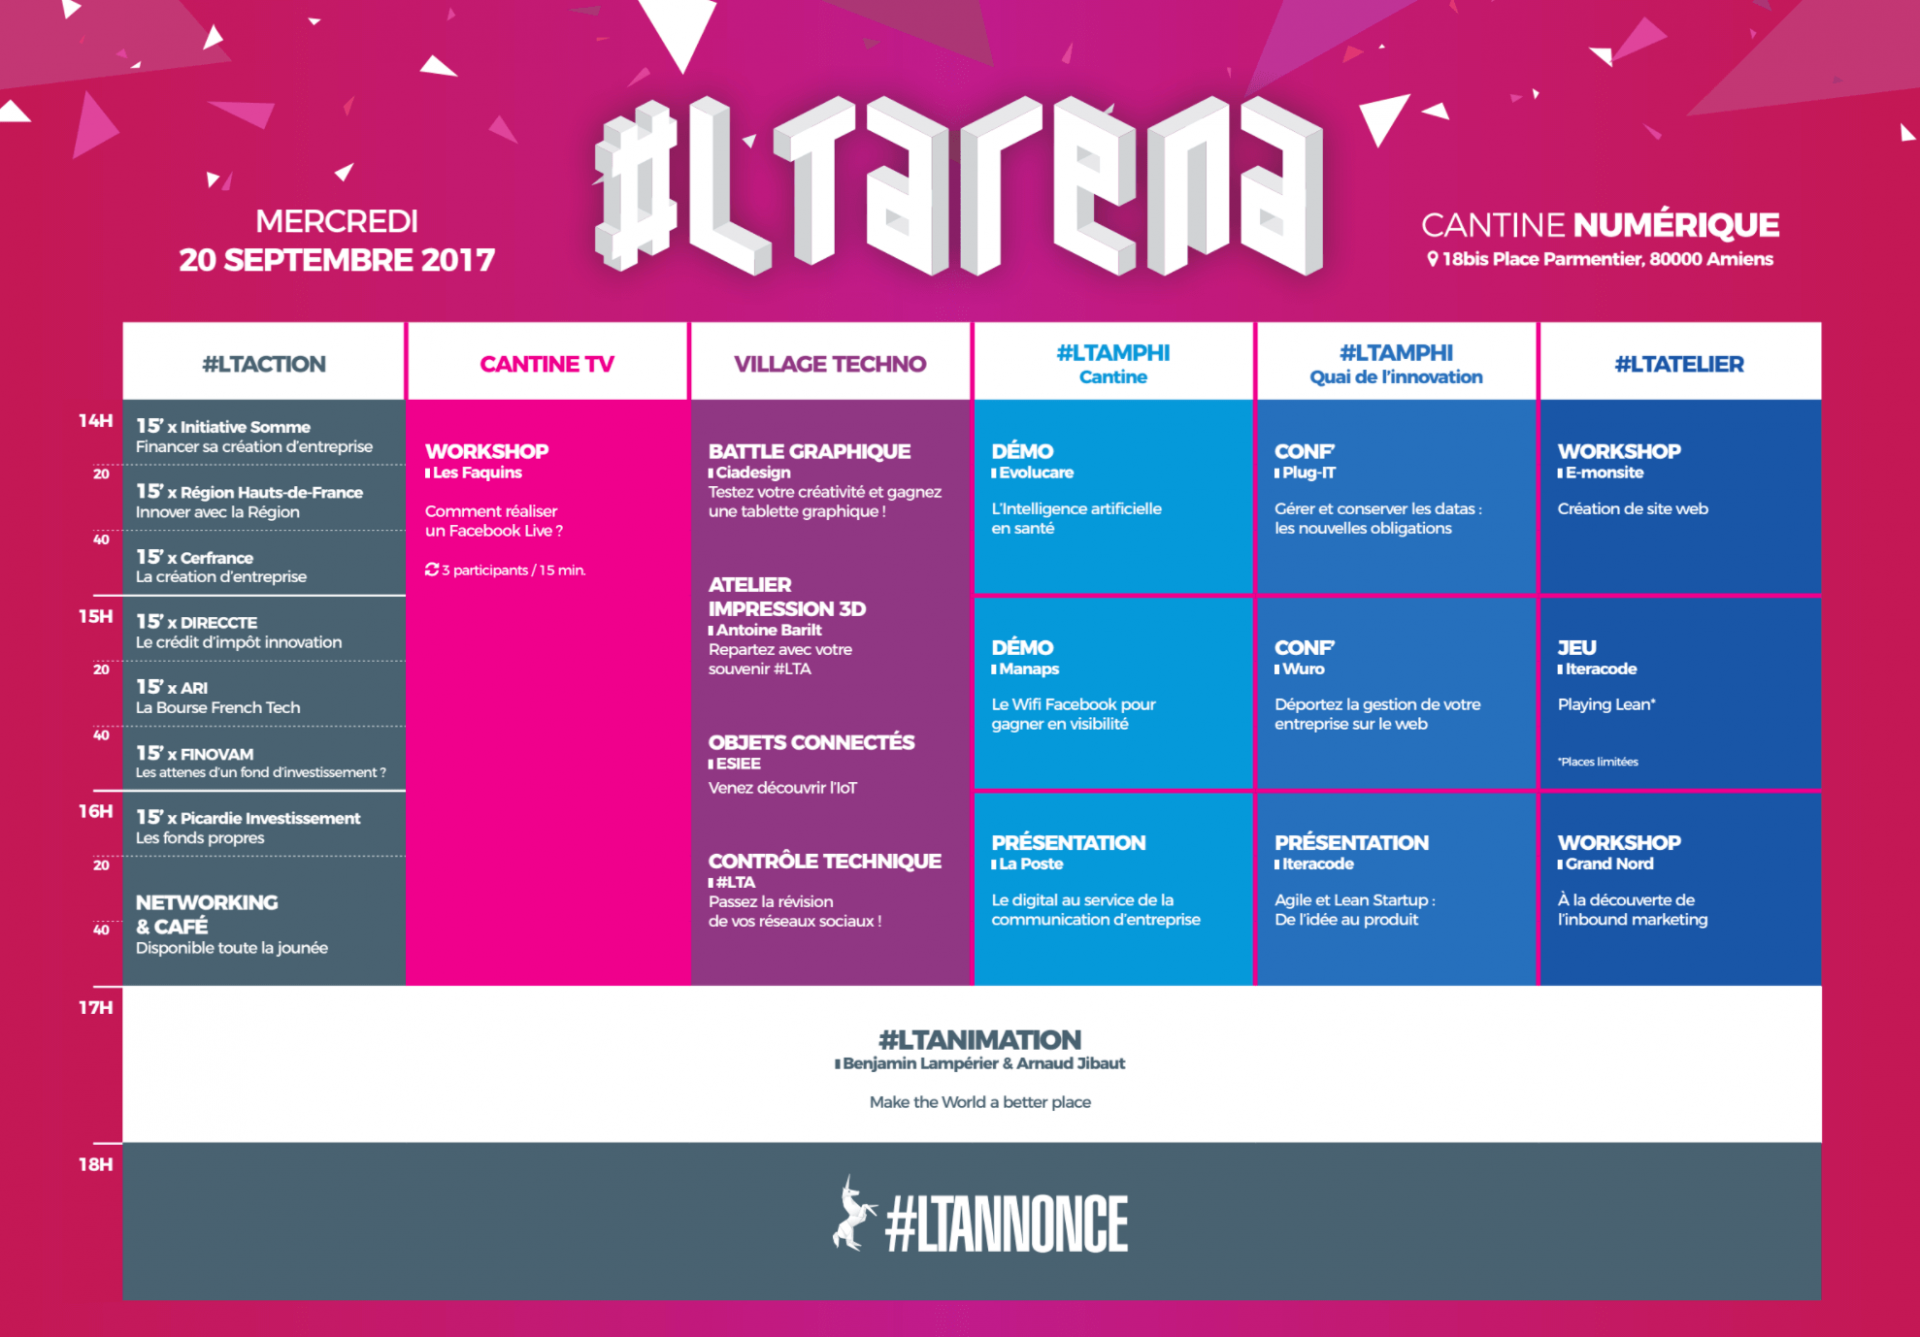 Programme #LTARENA